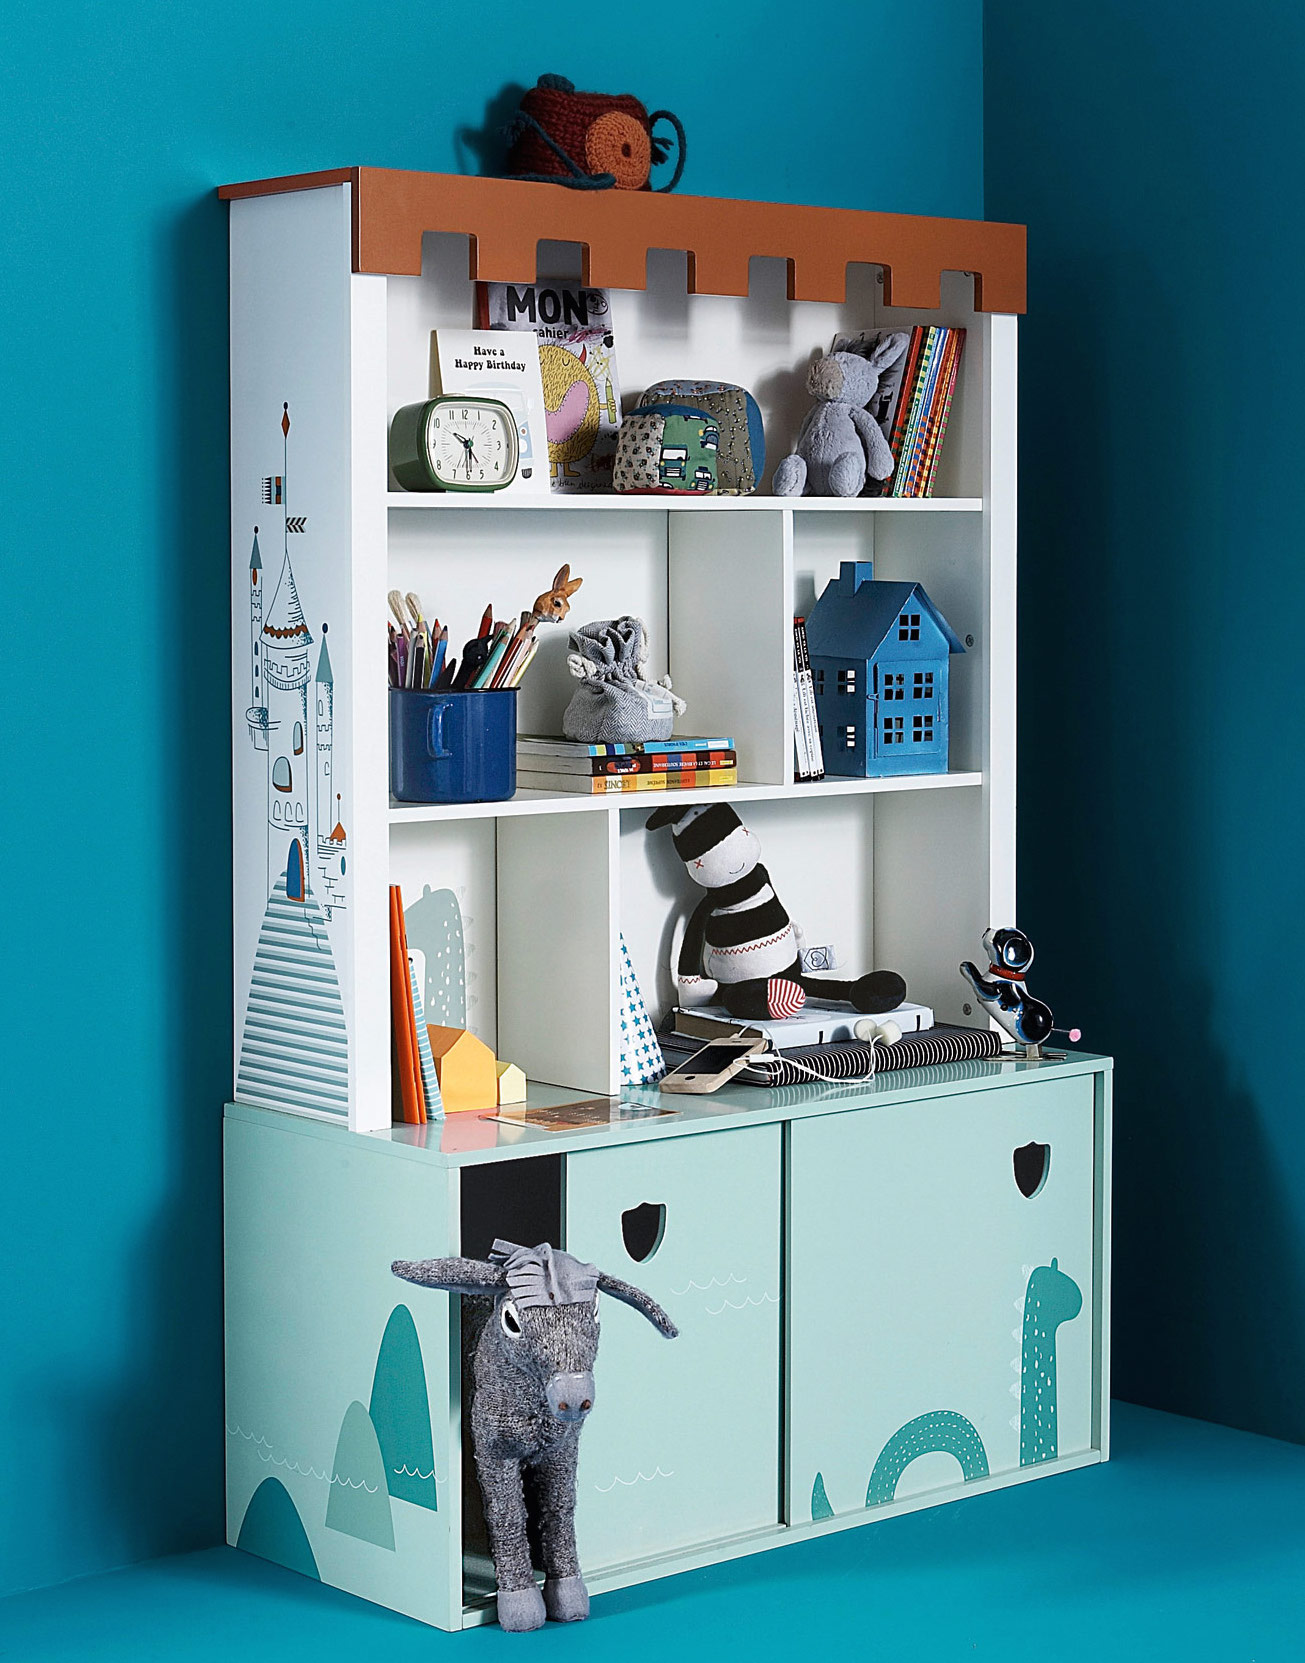 2 in 1 regal und puppenhaus berlinfreckles reiseblog mamablog. Black Bedroom Furniture Sets. Home Design Ideas